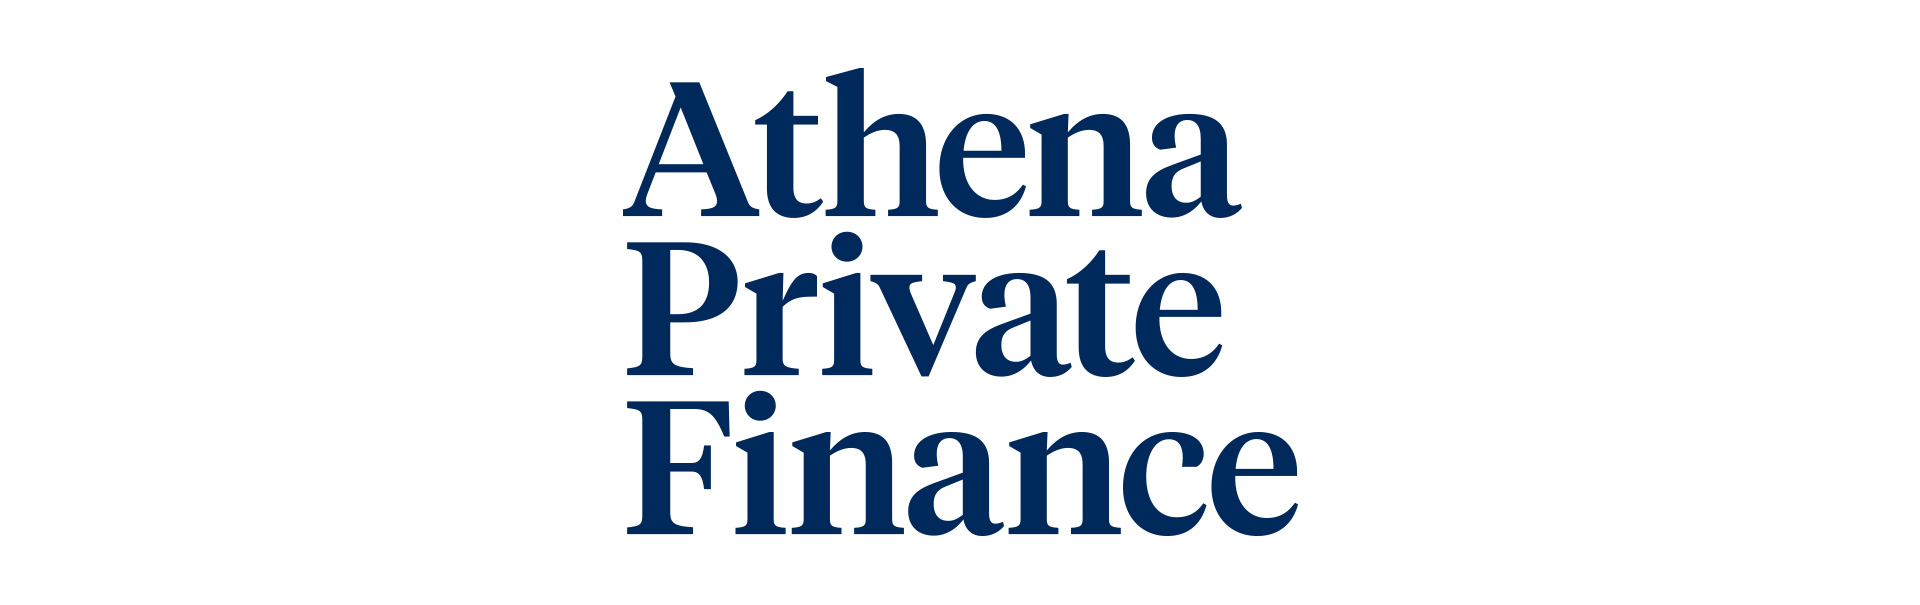 athena_PF_logo